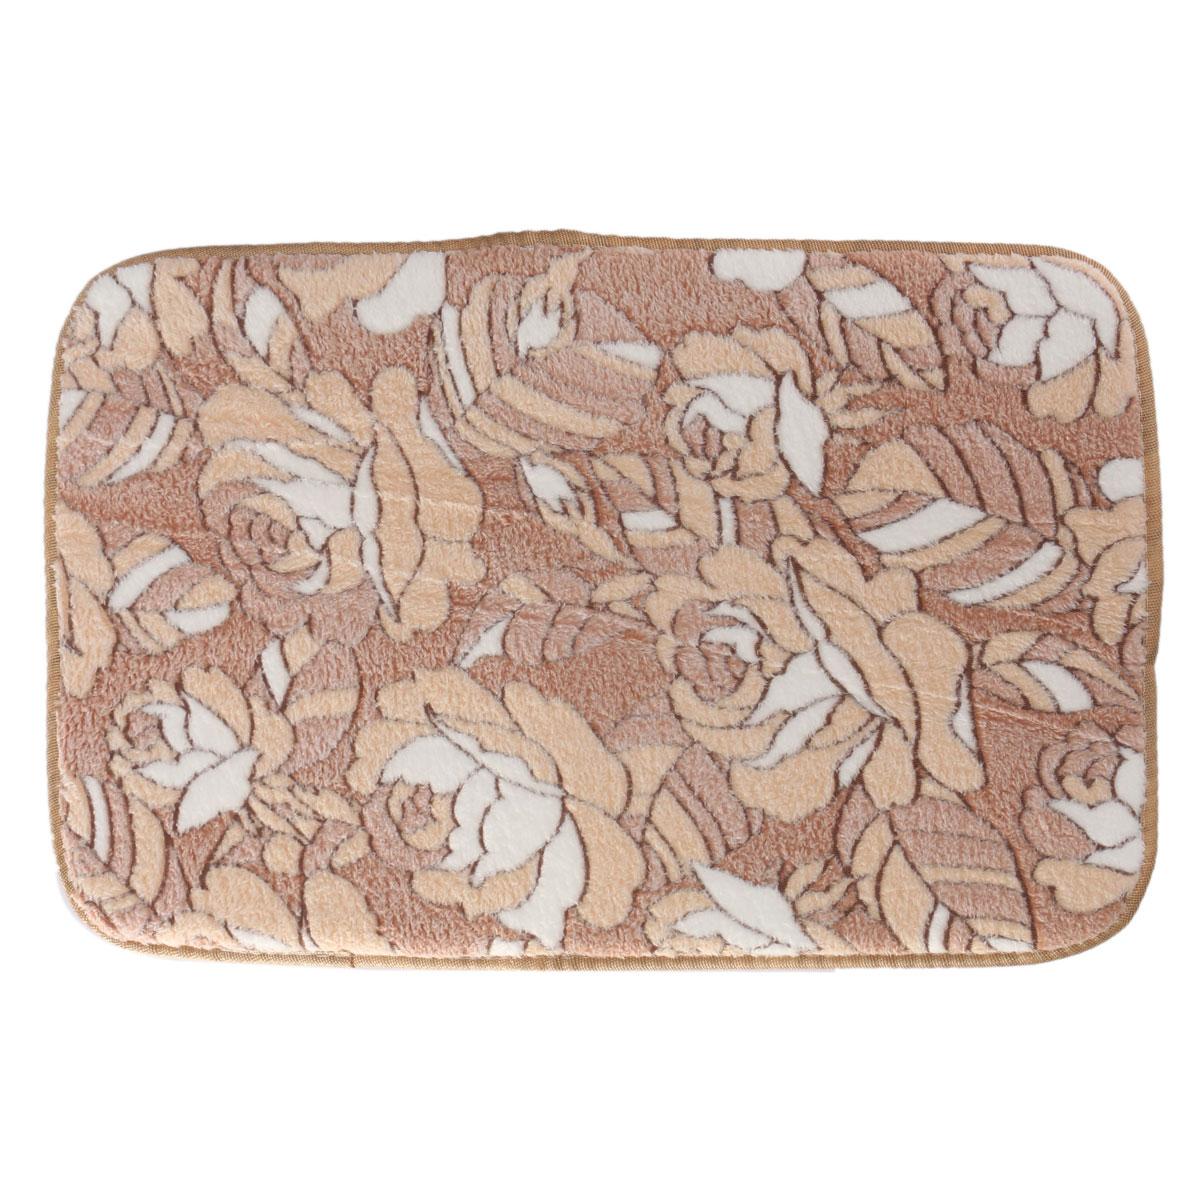 Soft Floor Rug Carpet Bath Bathroom Bedroom Home Kitchen Shower Mat Non Slip